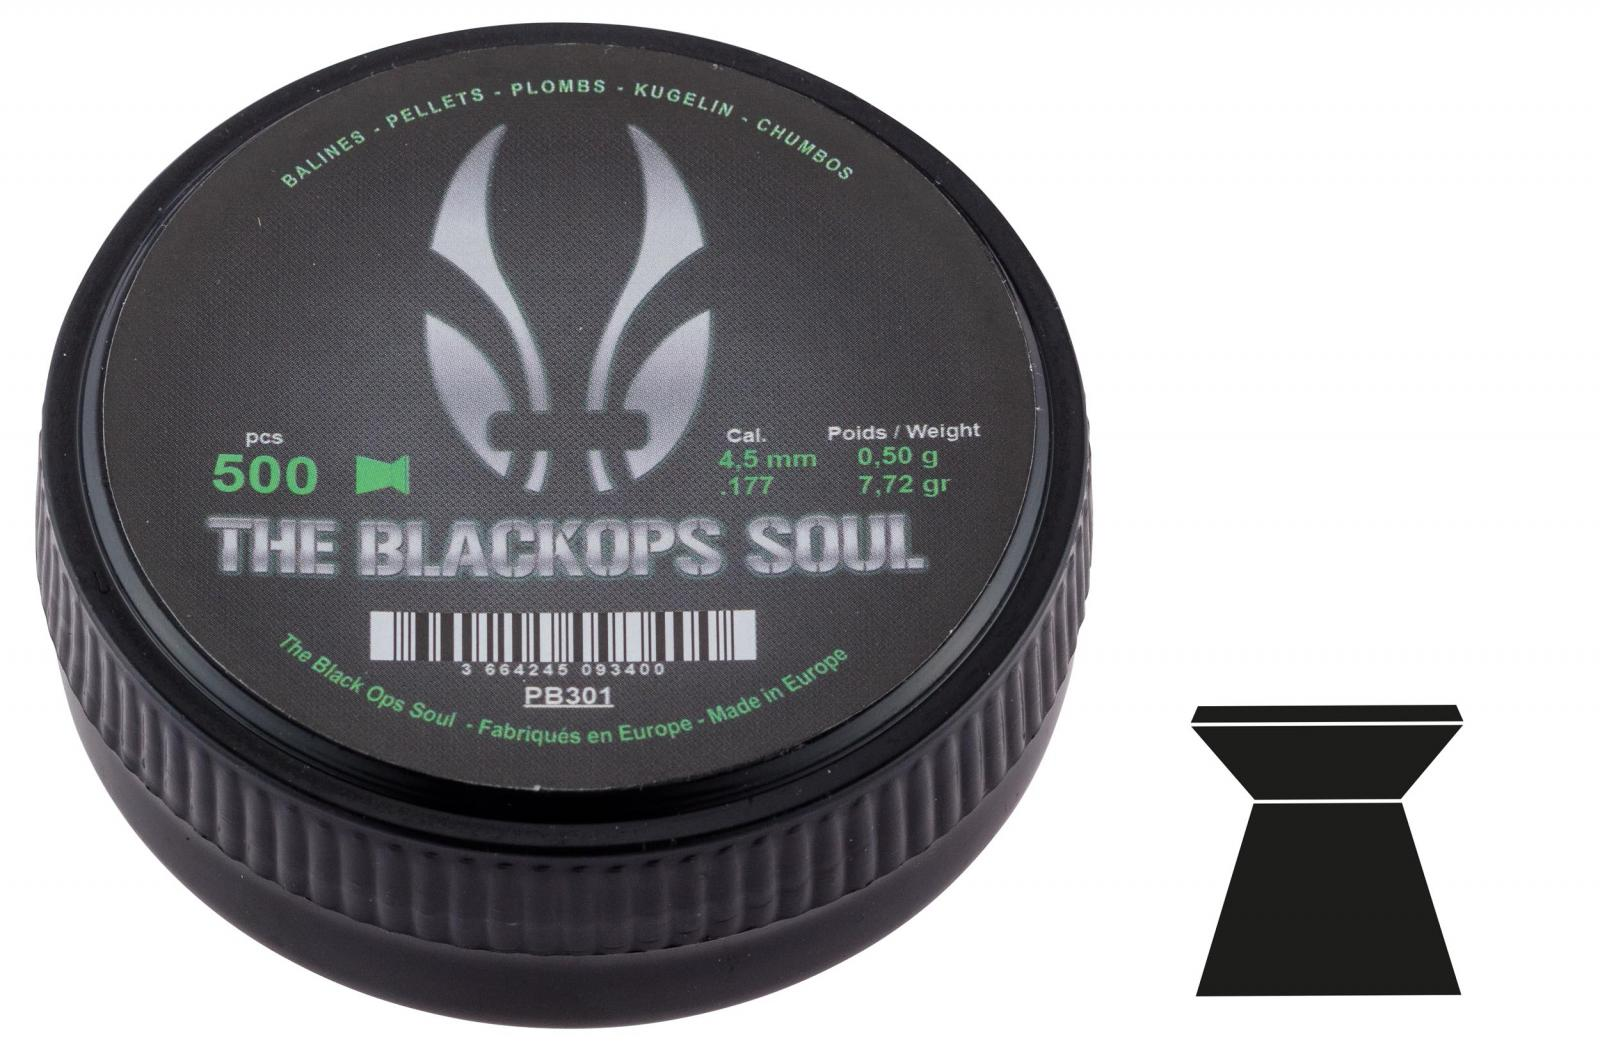 Boîte de 500 plombs BLACK OPS 4.5 mm à tête plate